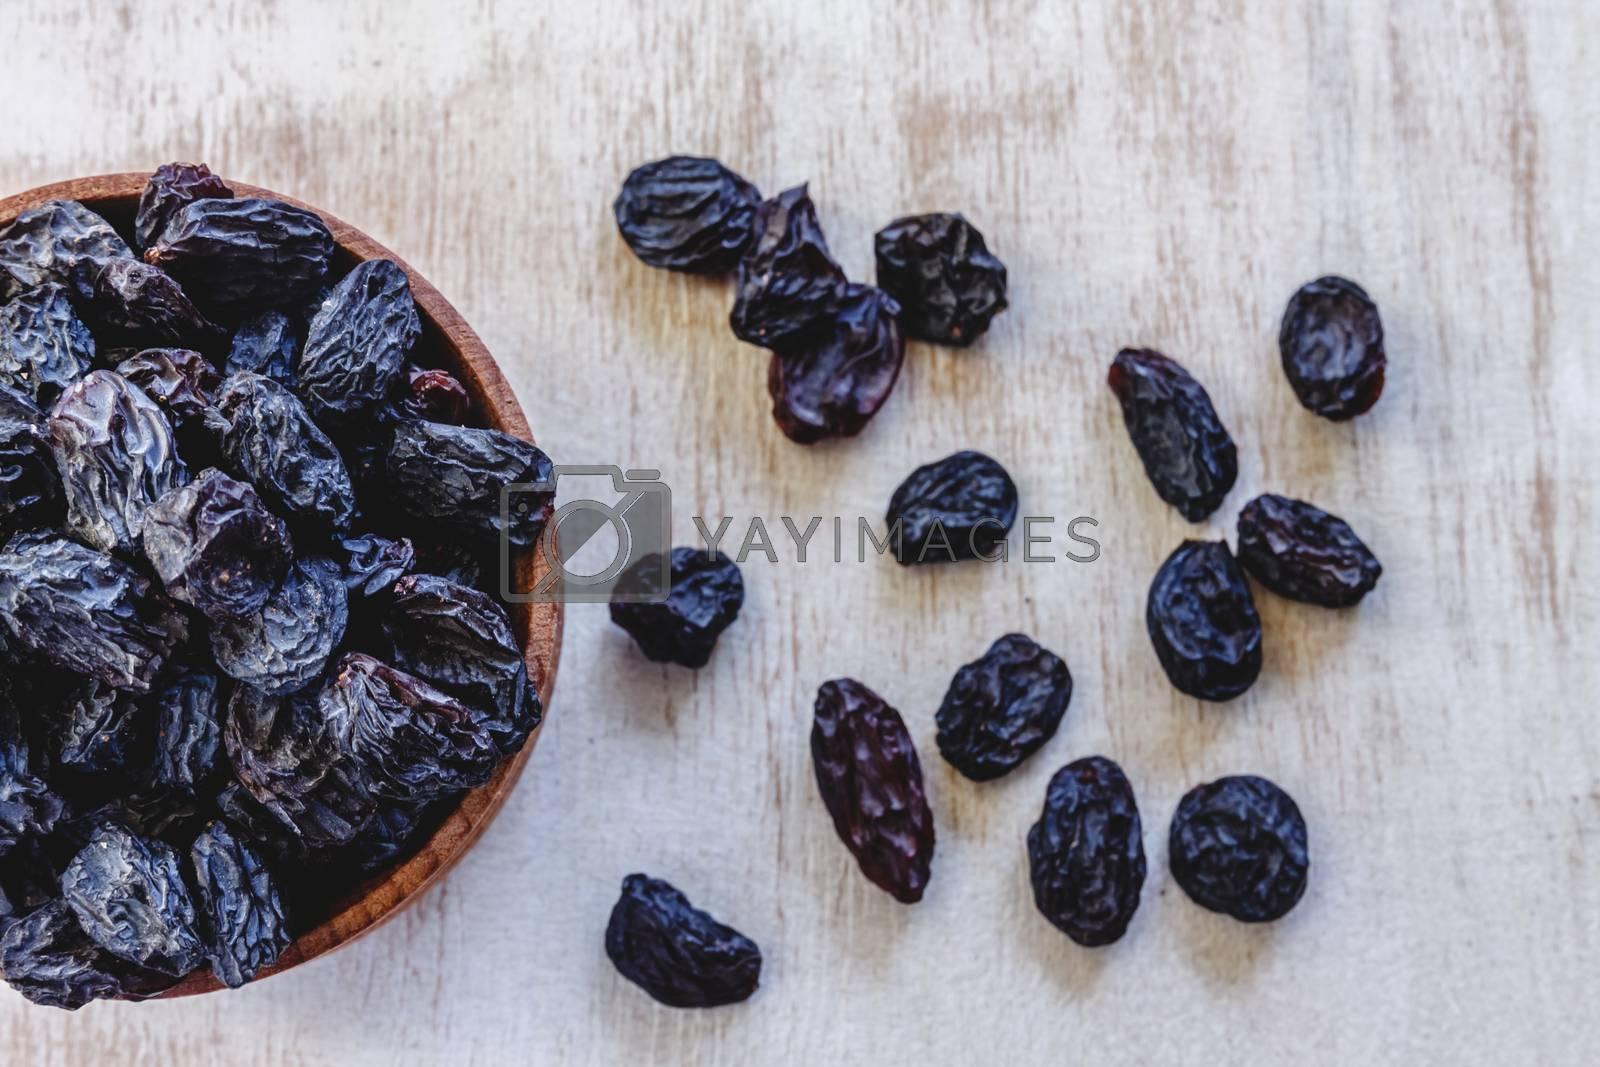 Dark blue raisins in a wooden bowl on a bright white background. by Tanacha